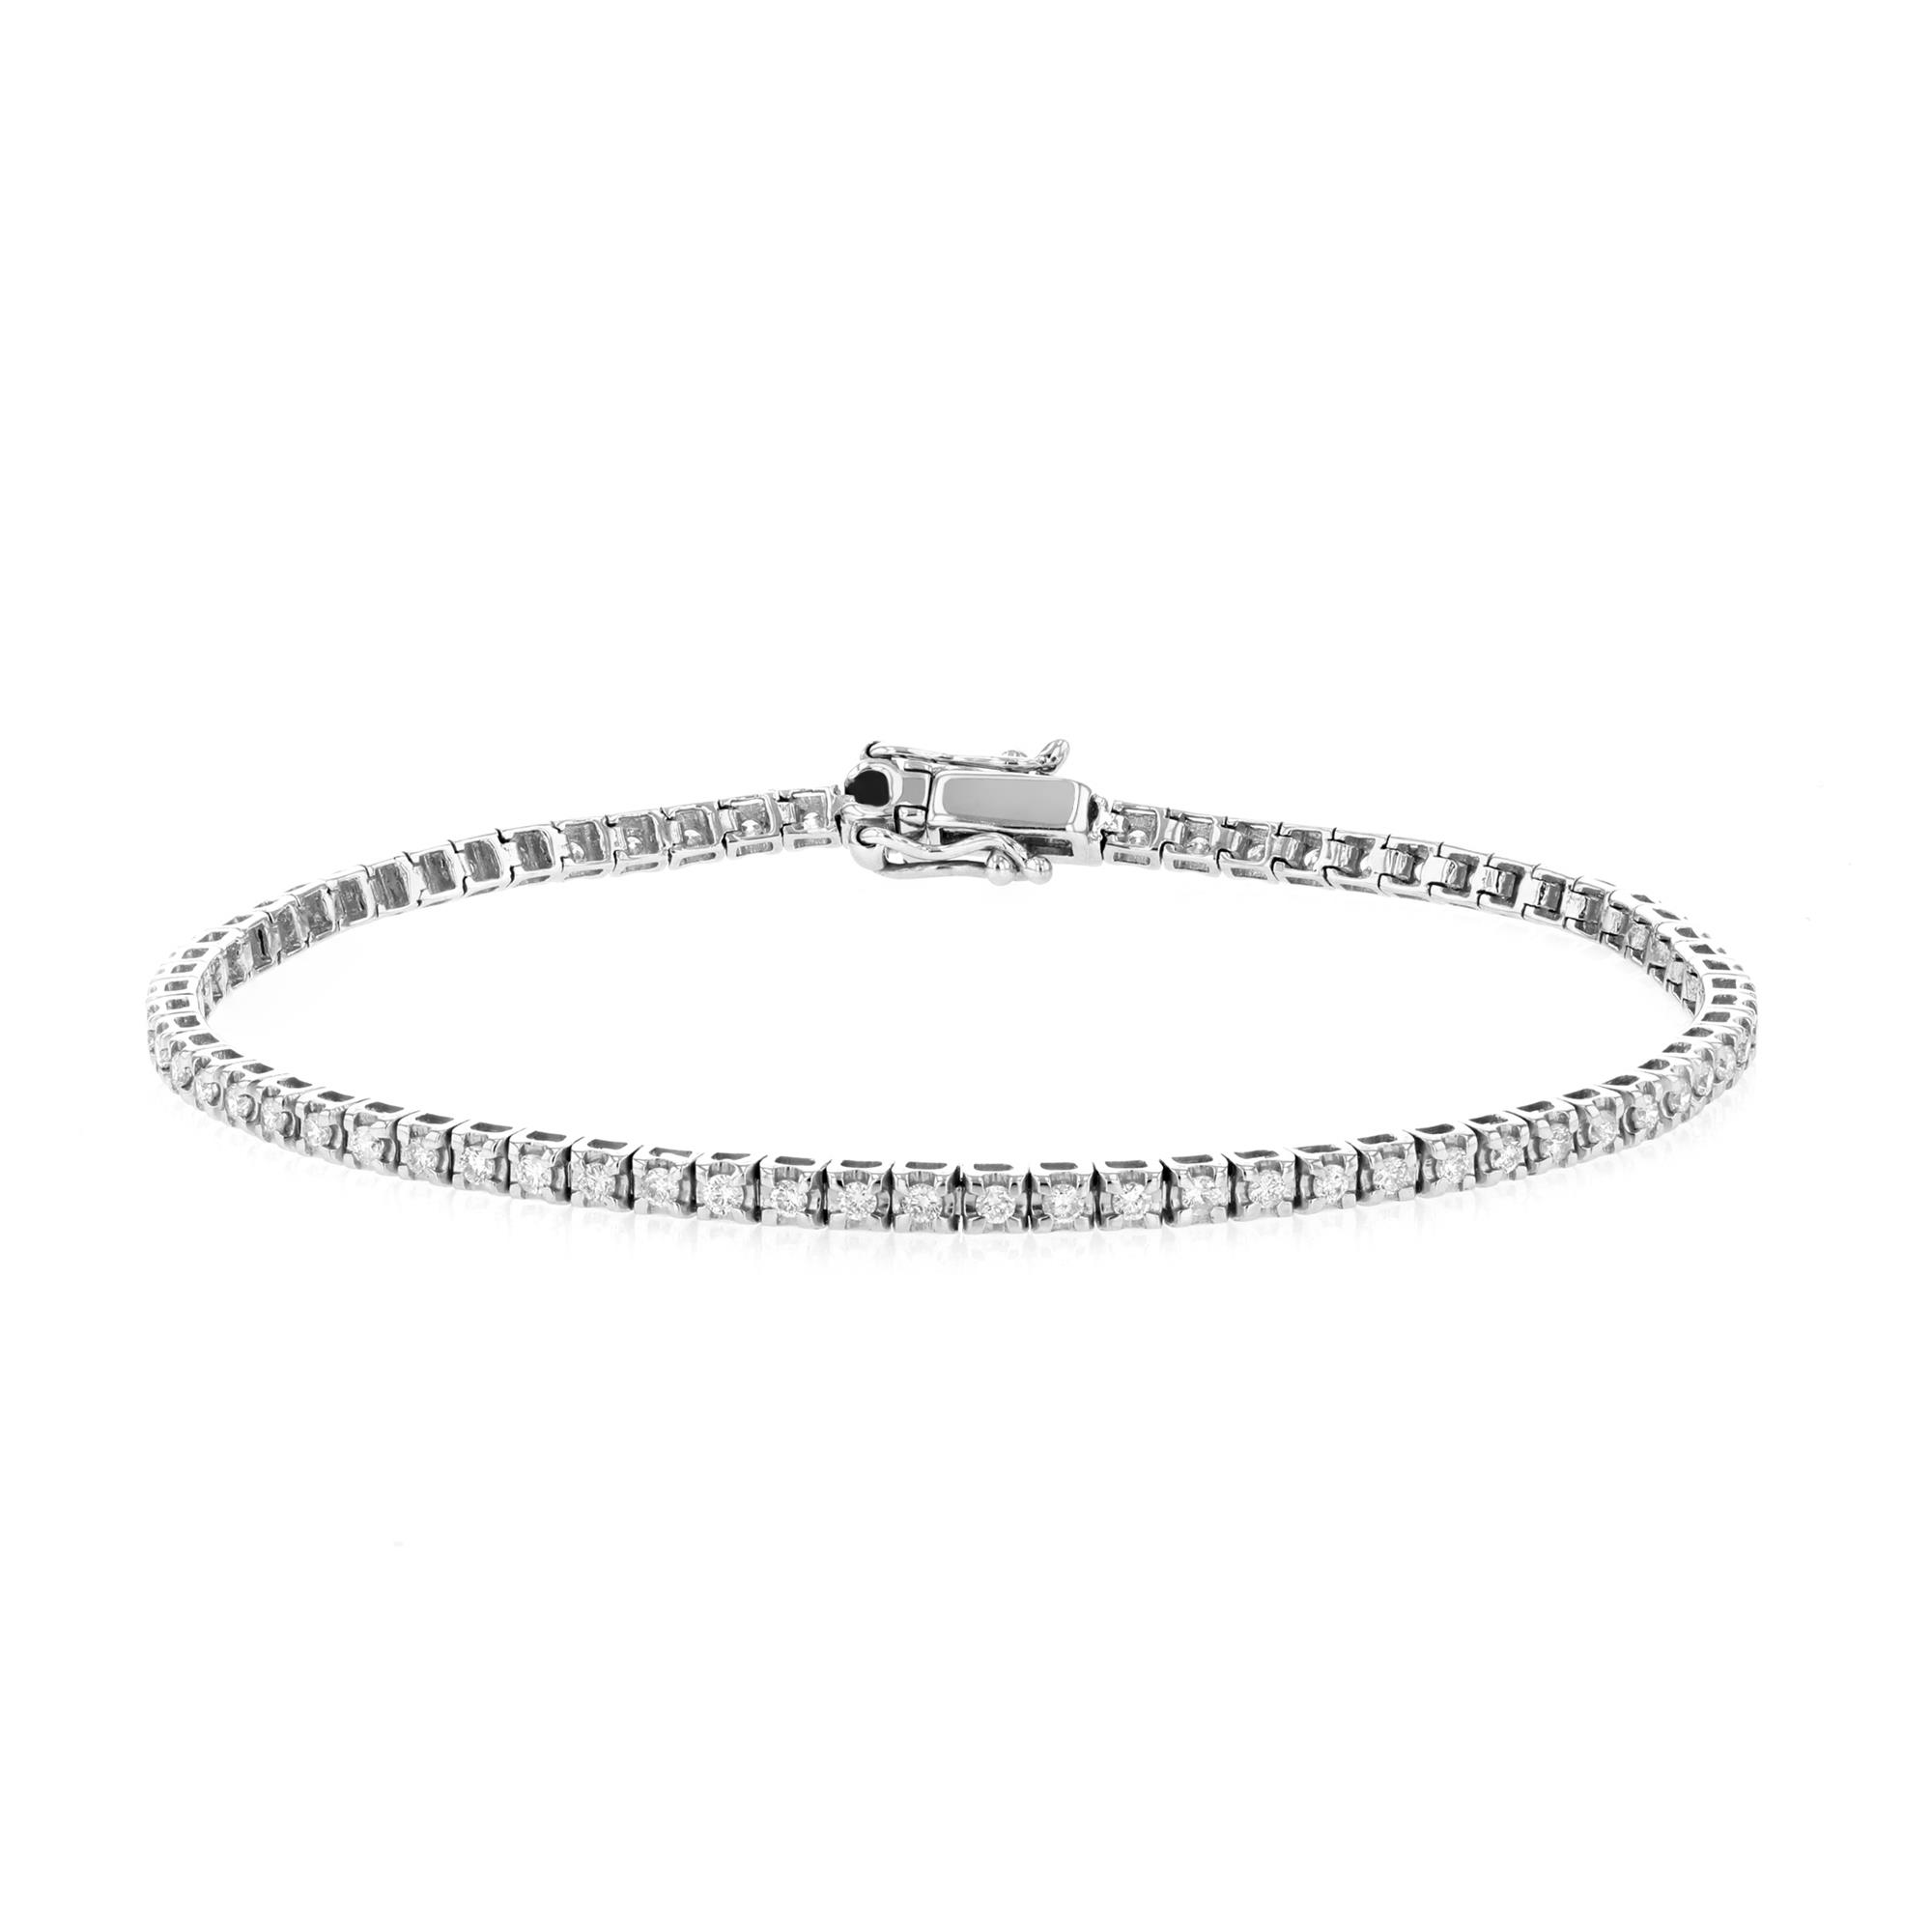 Radiance Collection 1.00ct Round Brilliant Diamond Tennis Bracelet | 9K White Gold